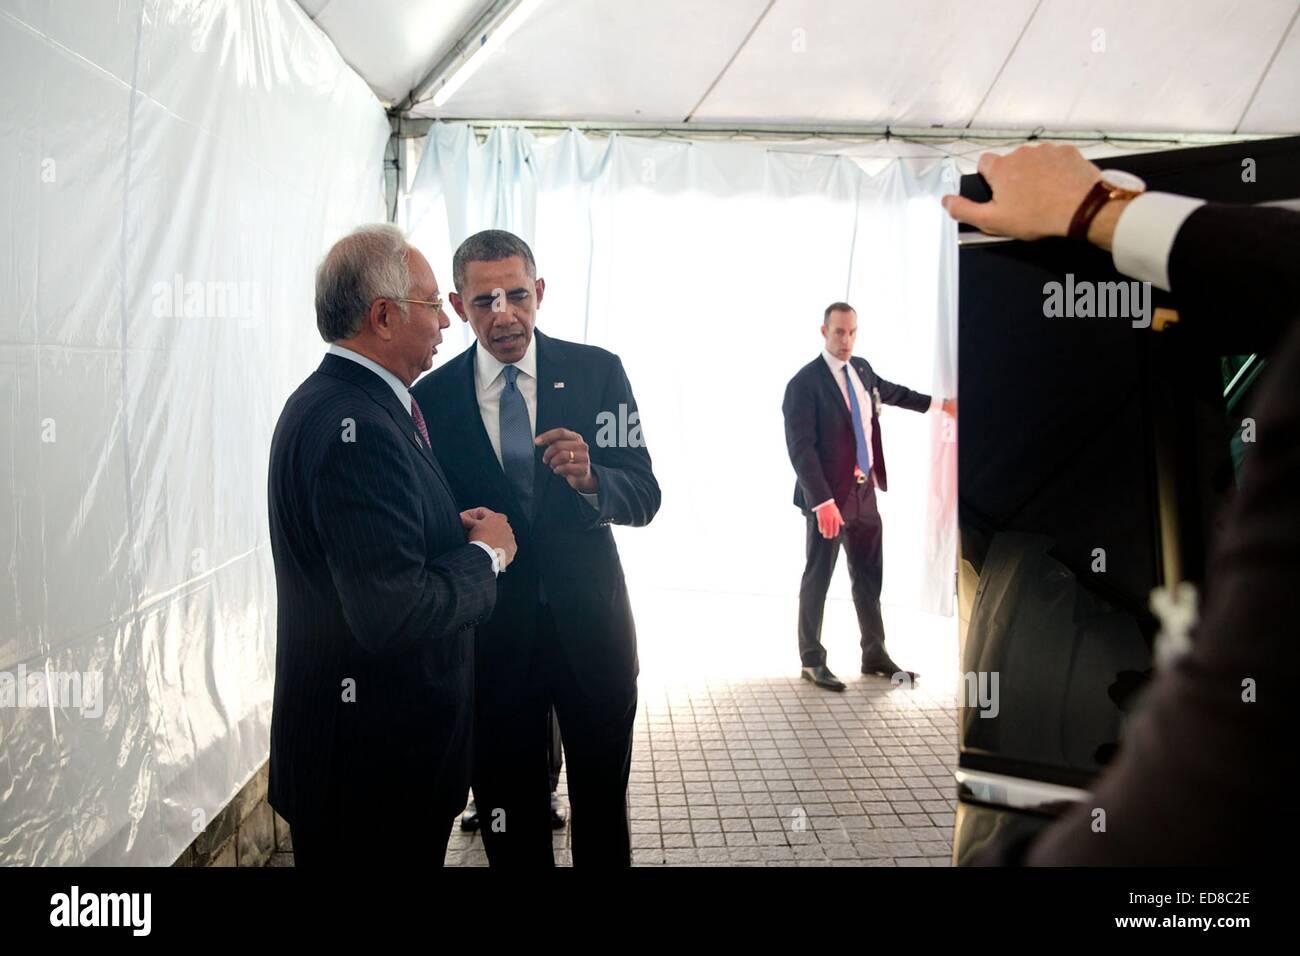 US President Barack Obama bids farewell to Prime Minister Mohammed Najib Abdul Razak of Malaysia April 28, 2014 - Stock Image